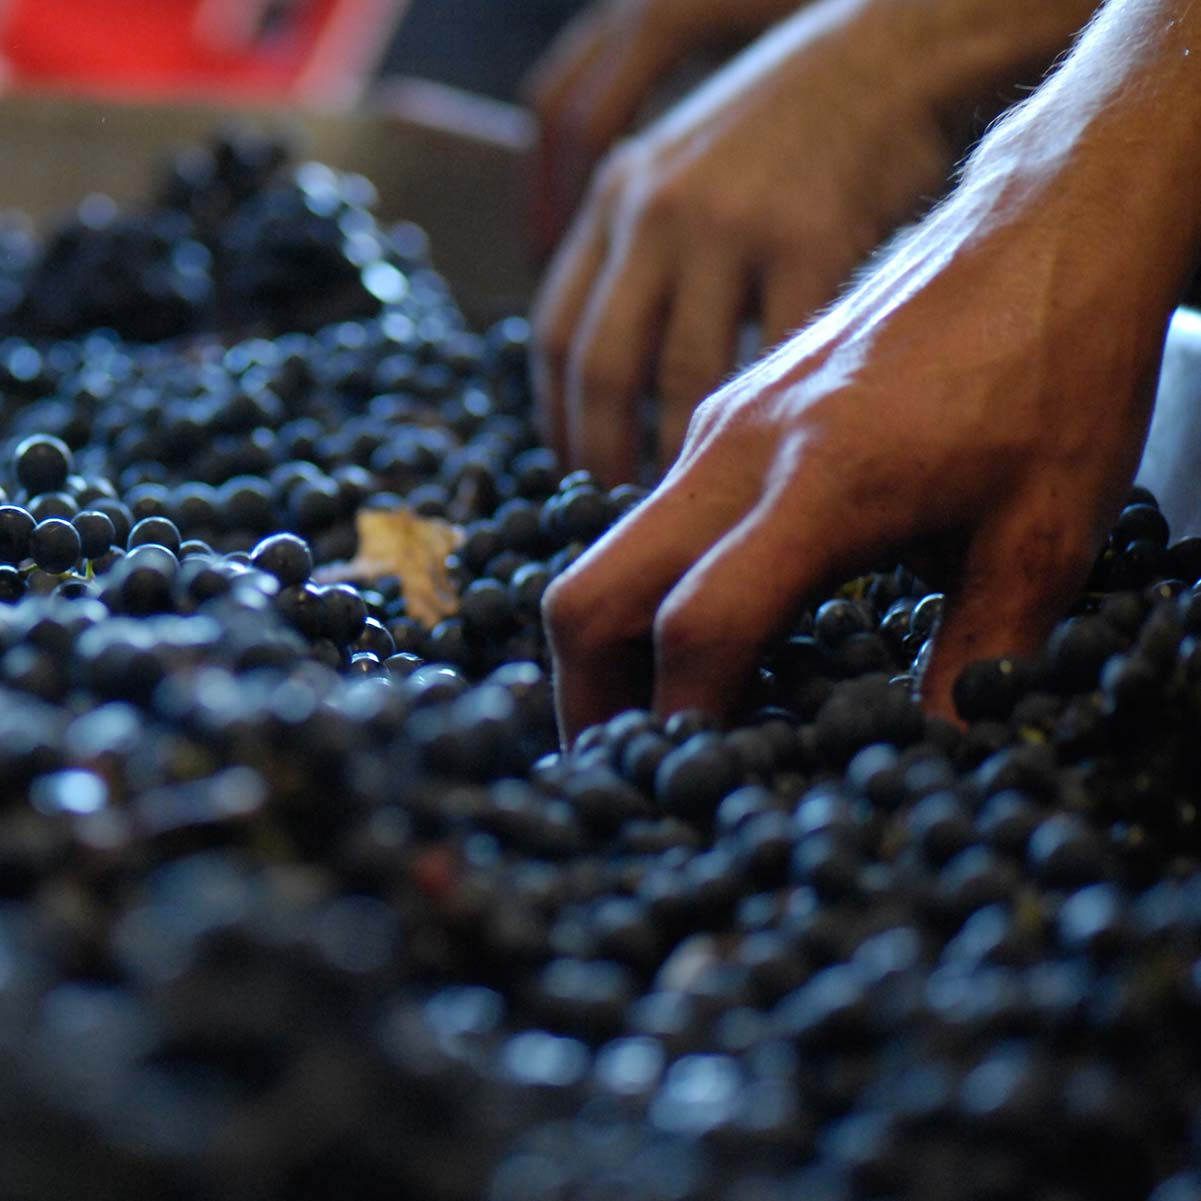 Tri manuel des raisins